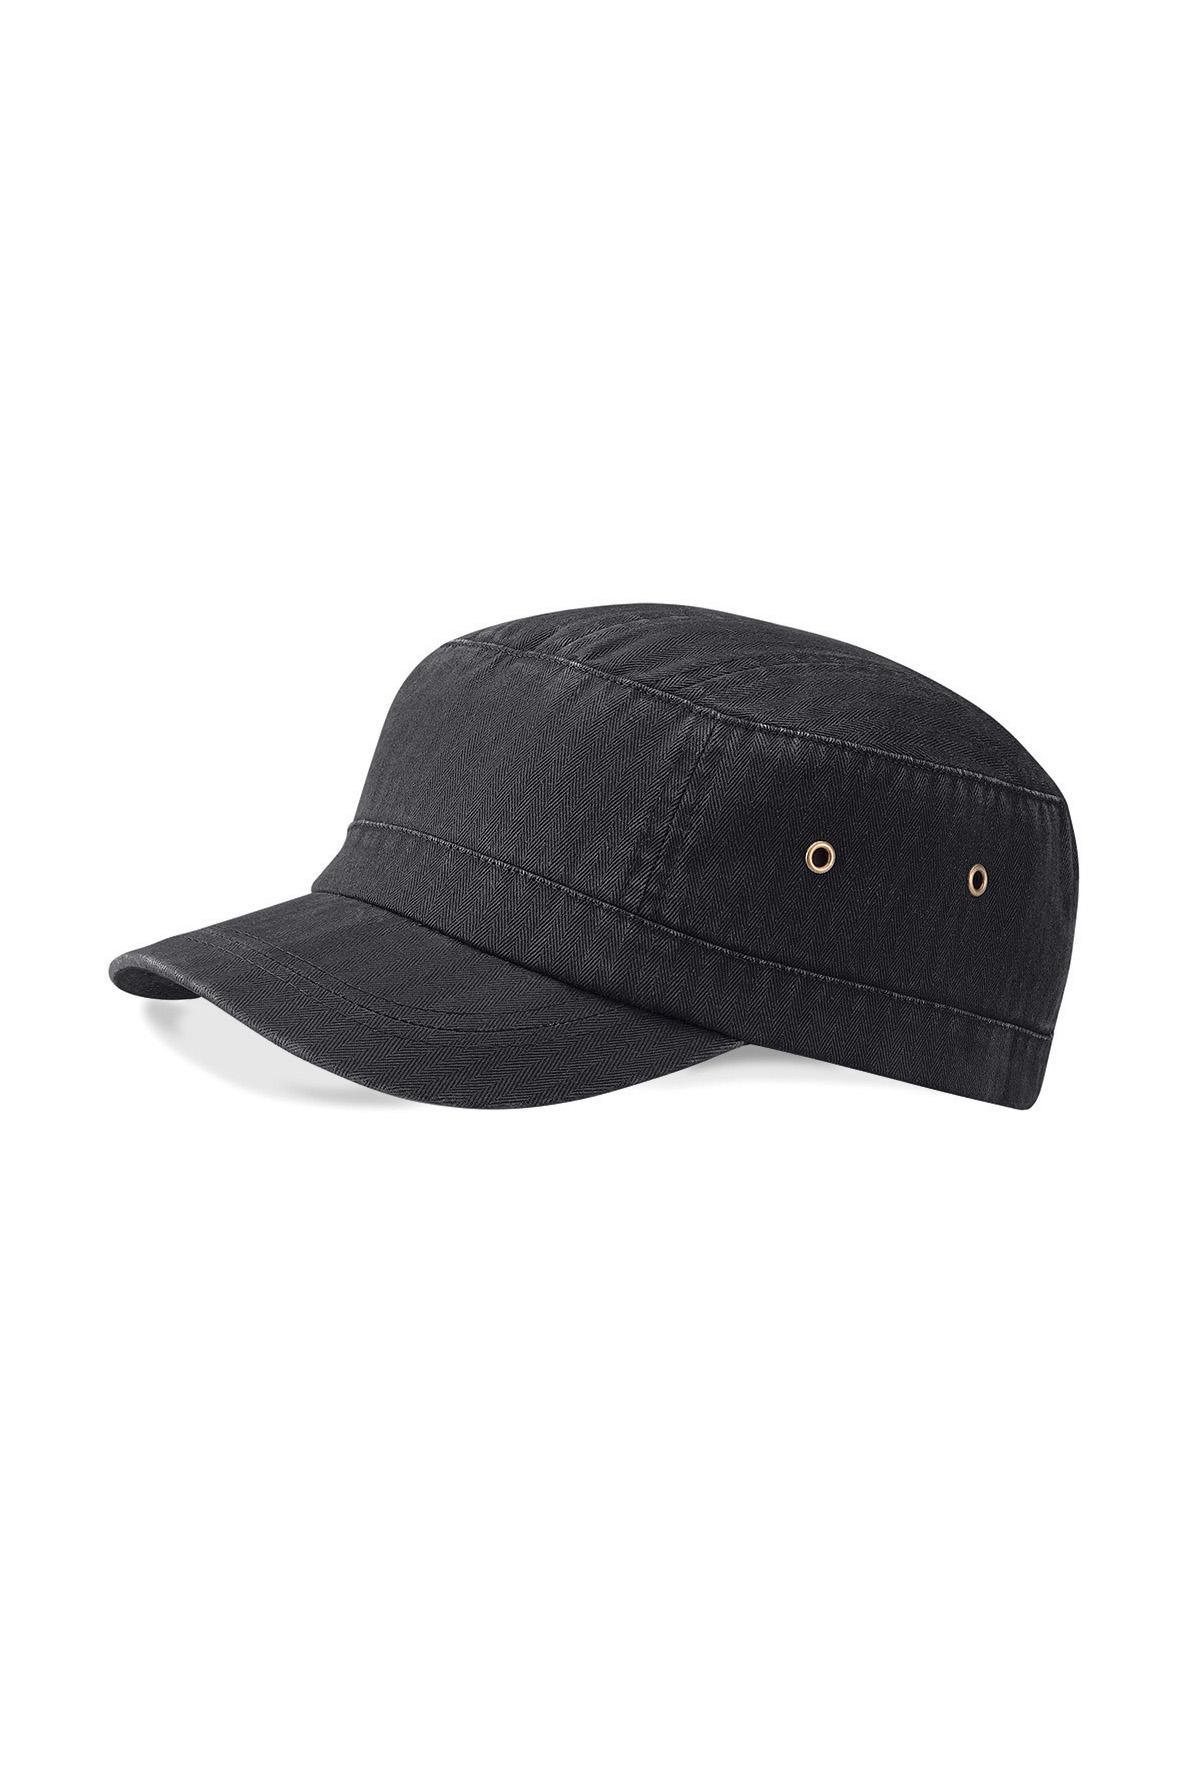 Urban Armylippis Musta